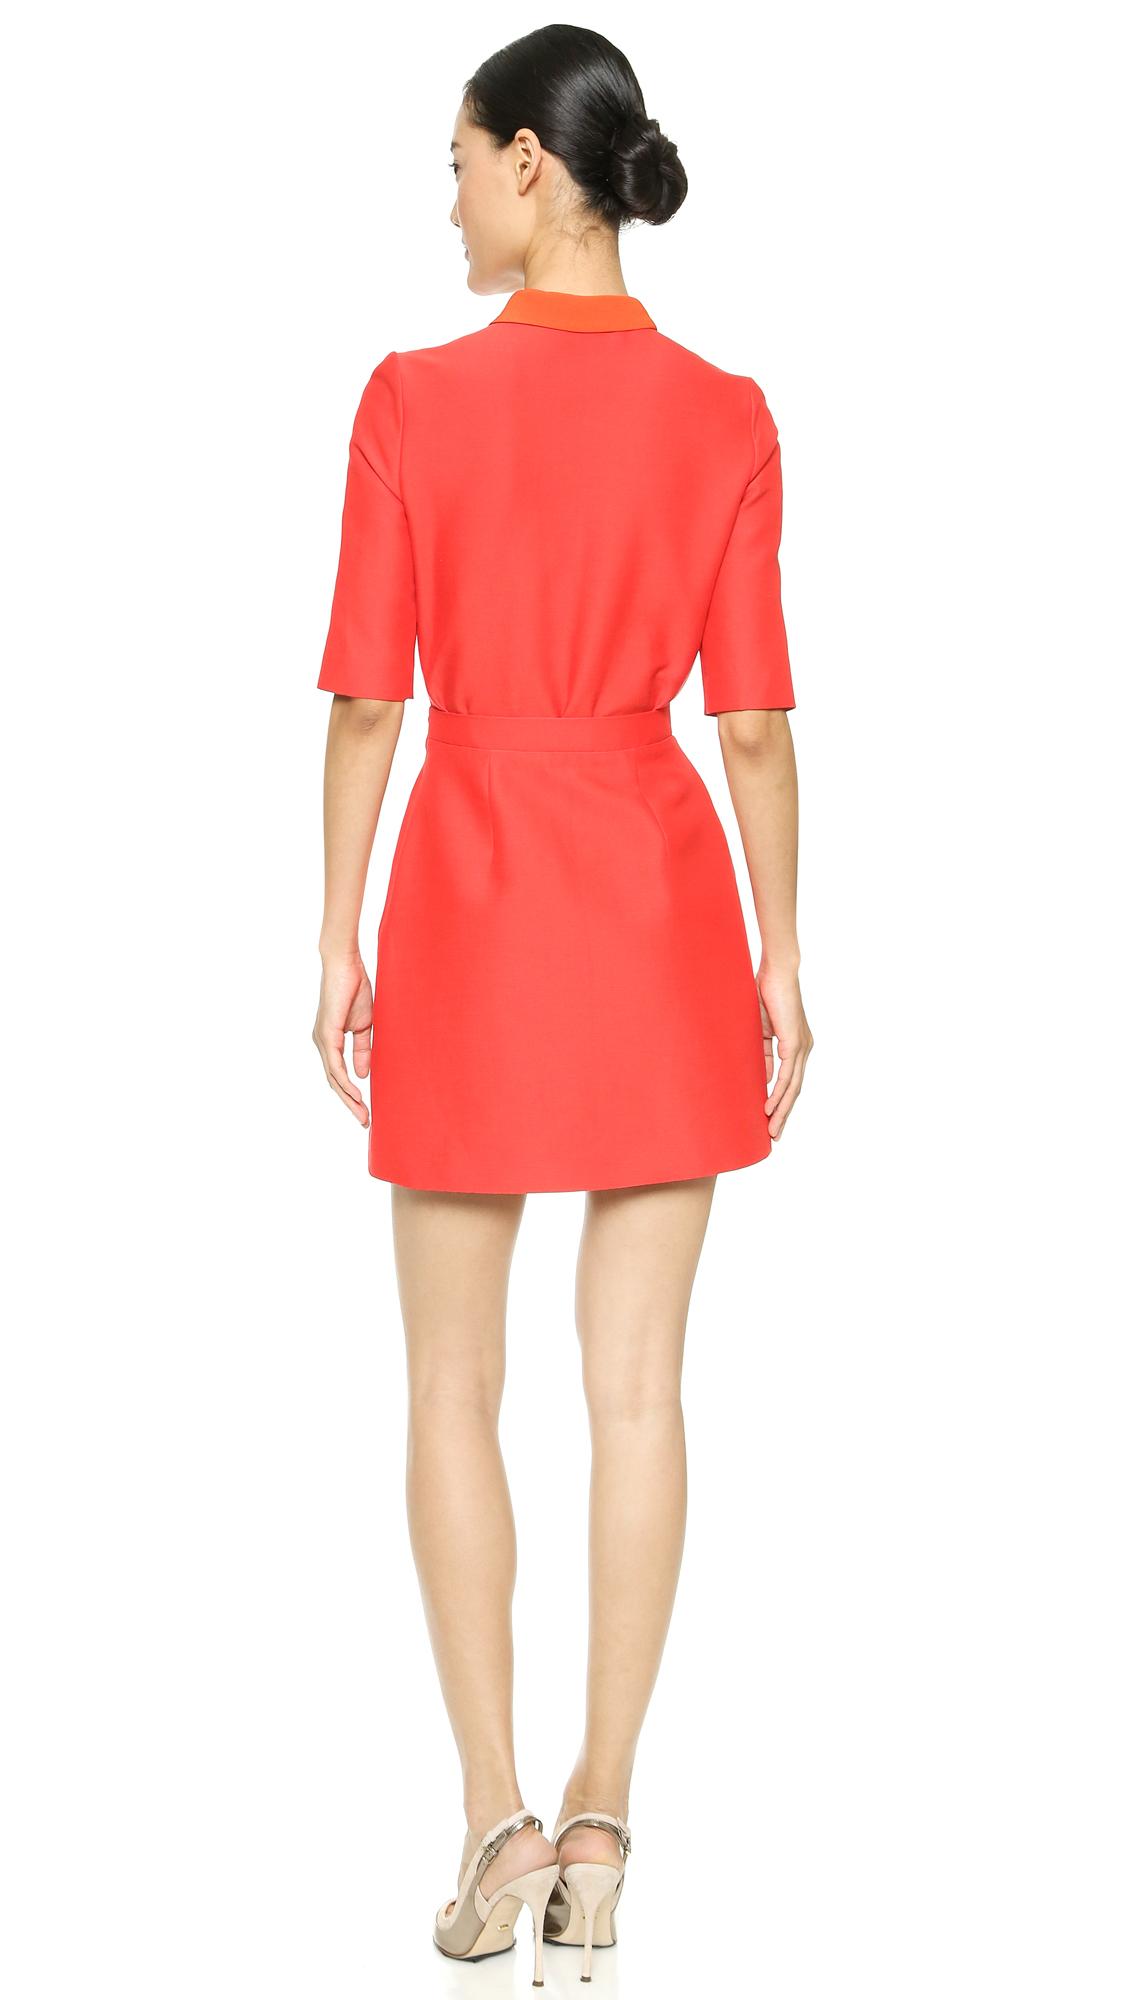 Ralph Lauren Rosy Mesh Polo Sexy Collar Dress